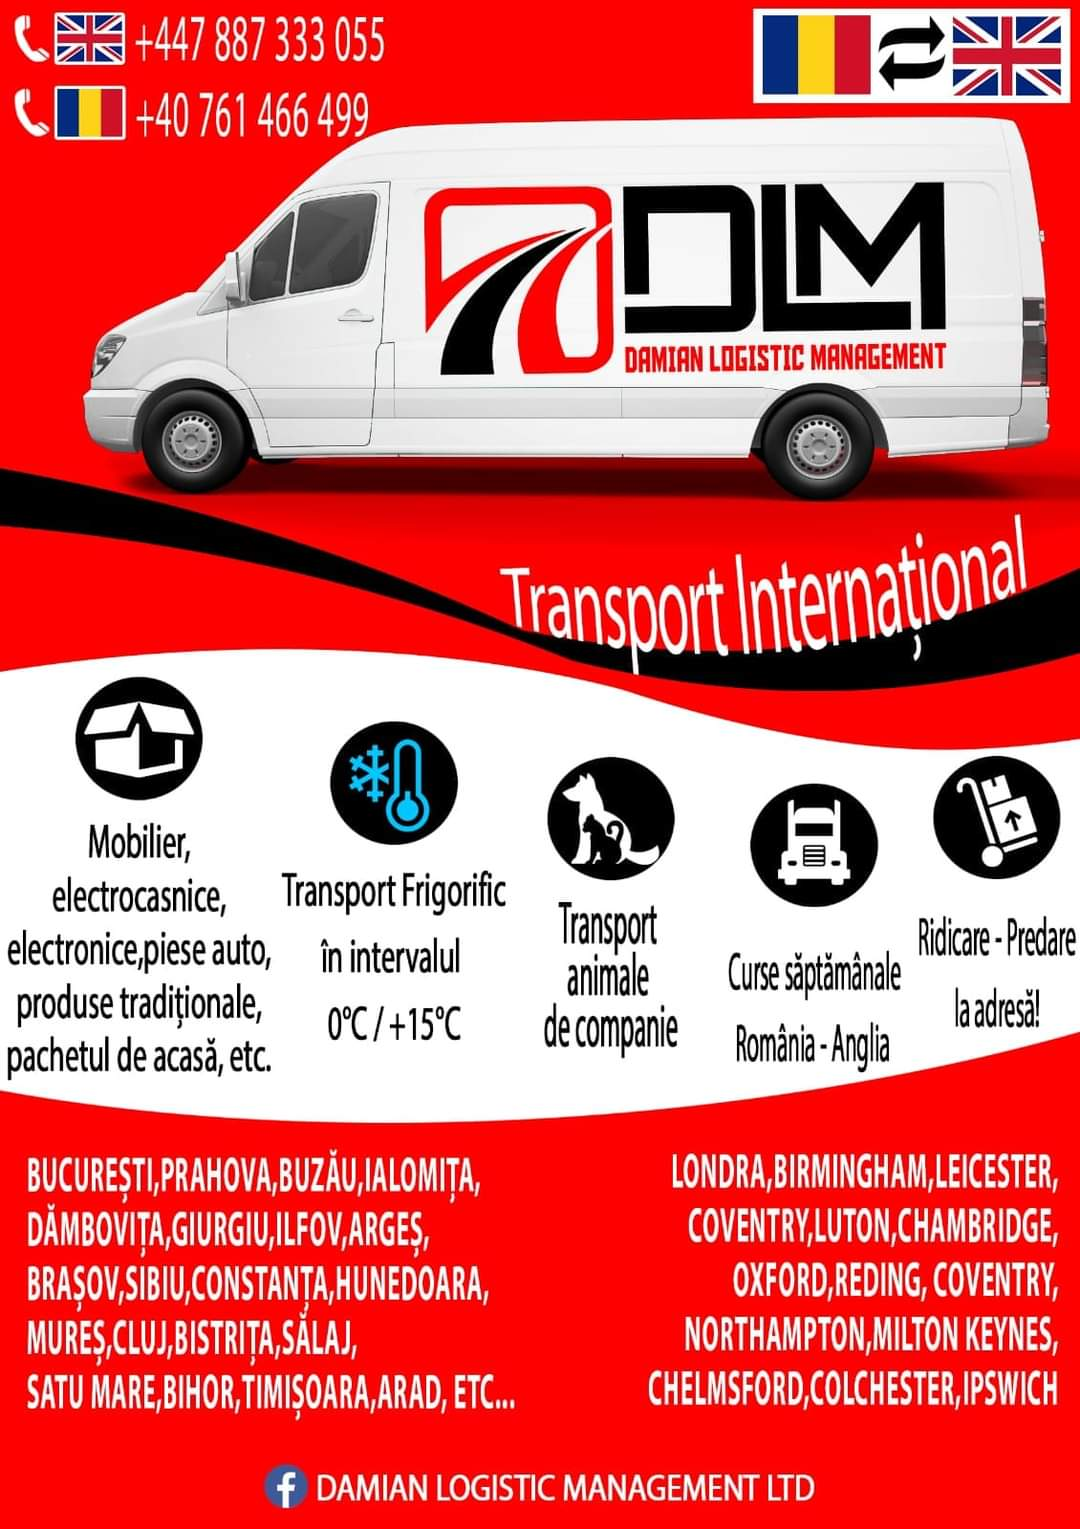 Transport international Romania Anglia‼️